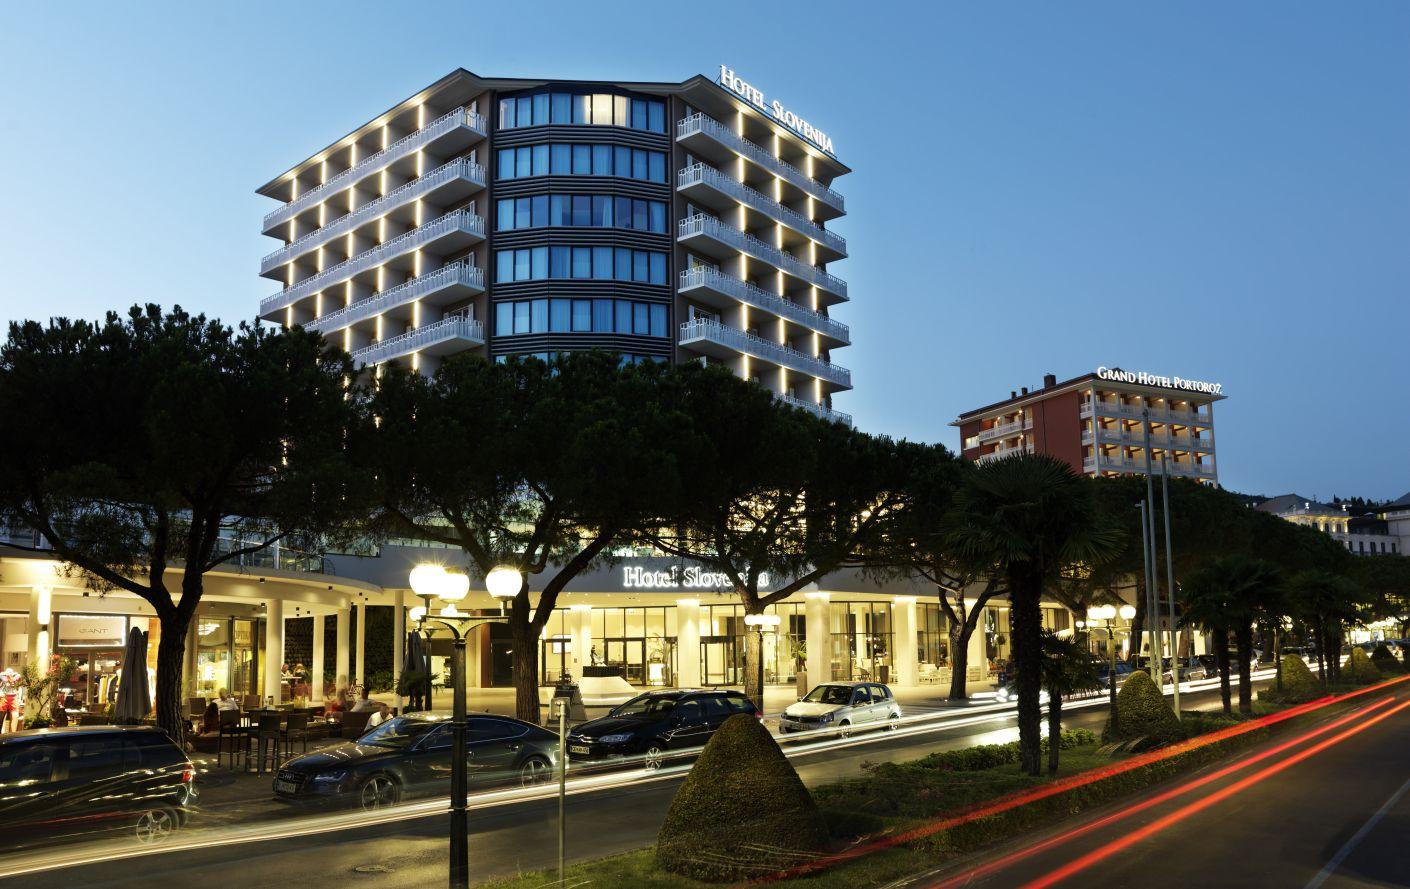 Mind hotel slovenija portoro piran for Wellness hotel slovenia